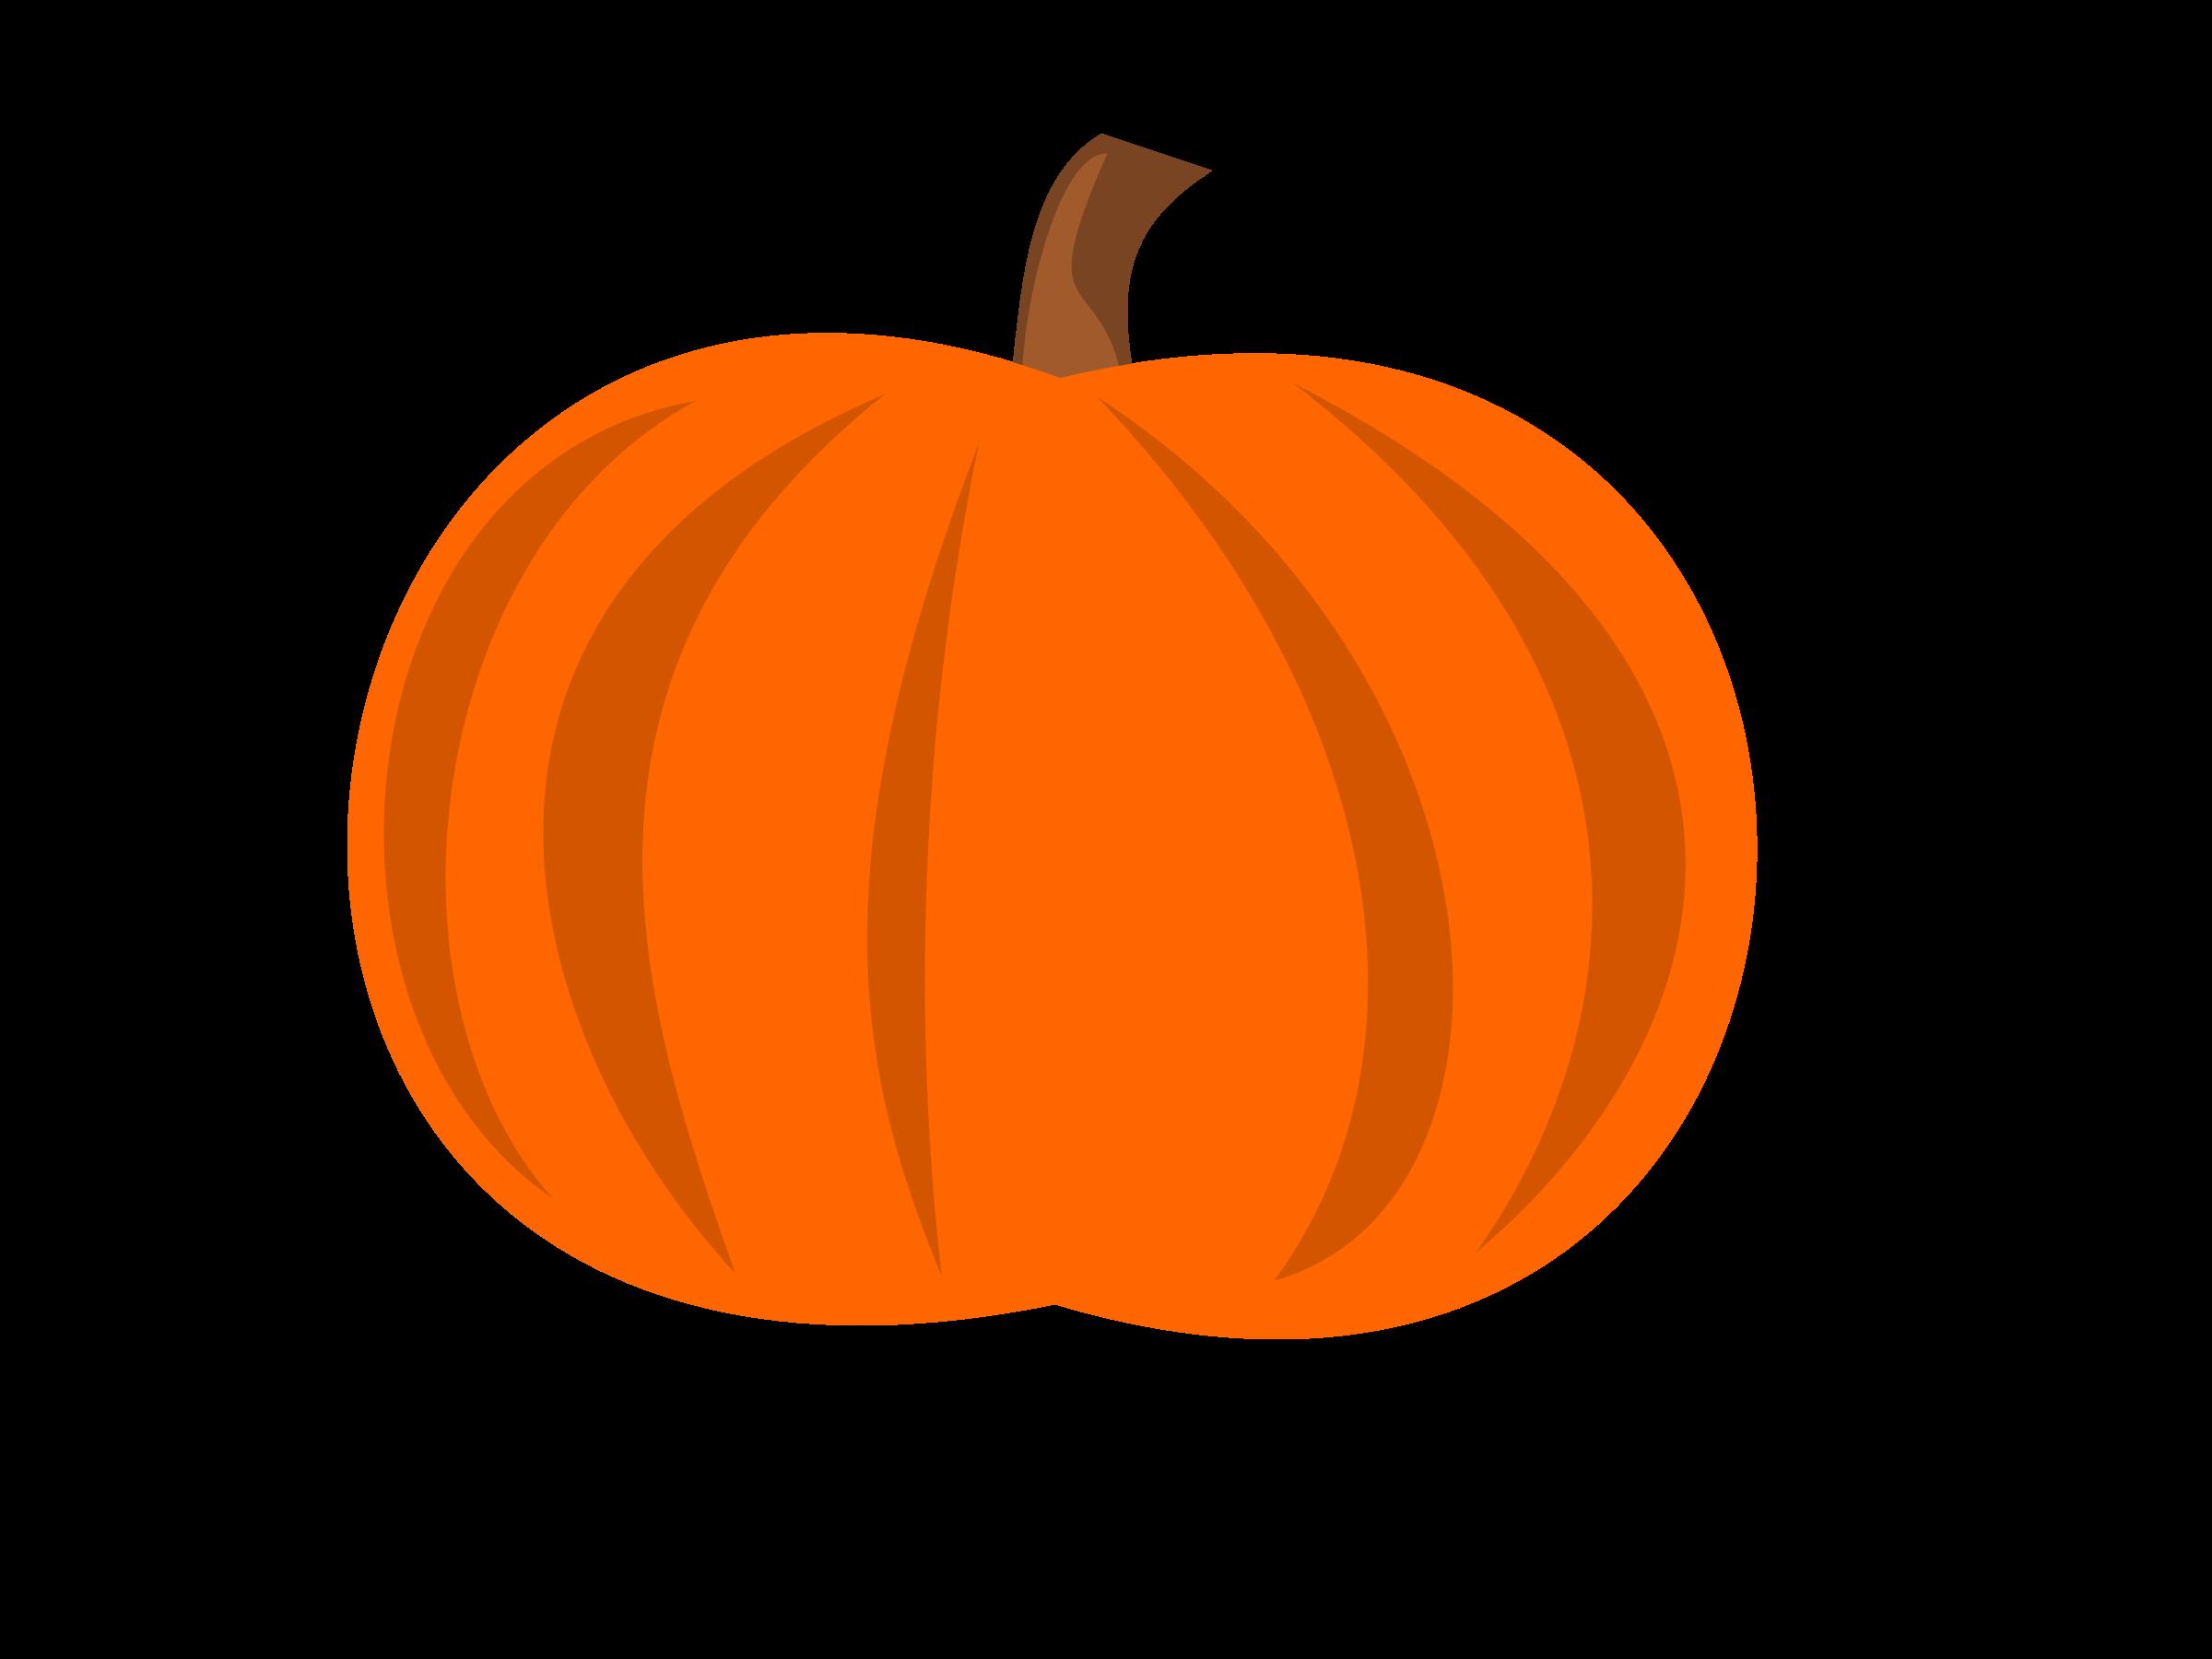 Free Pumpkin Vector